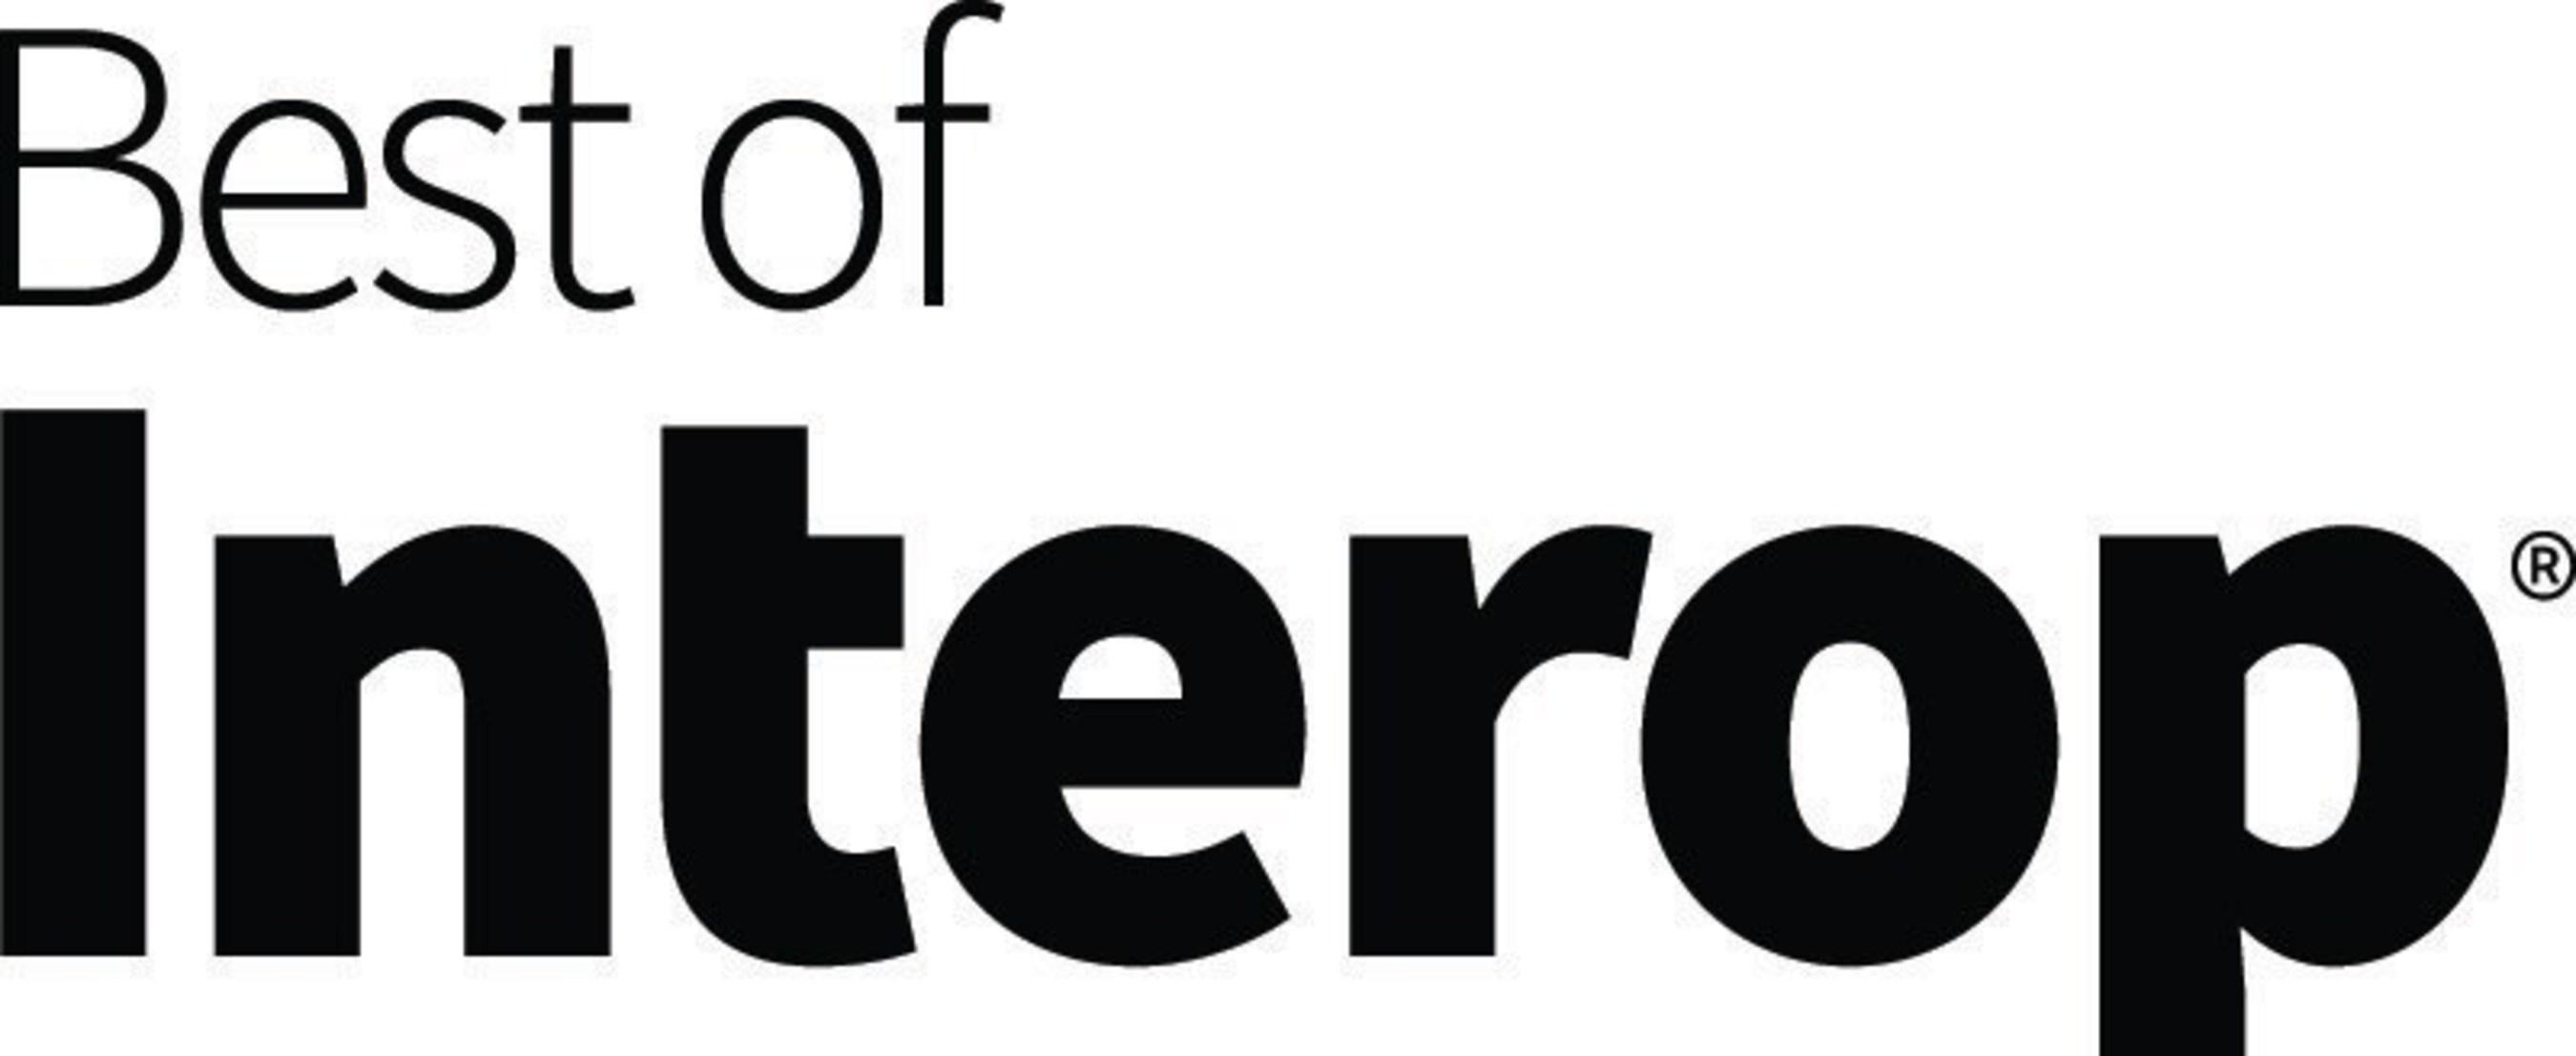 Interop Las Vegas 2016 Announces Leading IT Services Across 10 Categories as Best of Interop Award Finalists